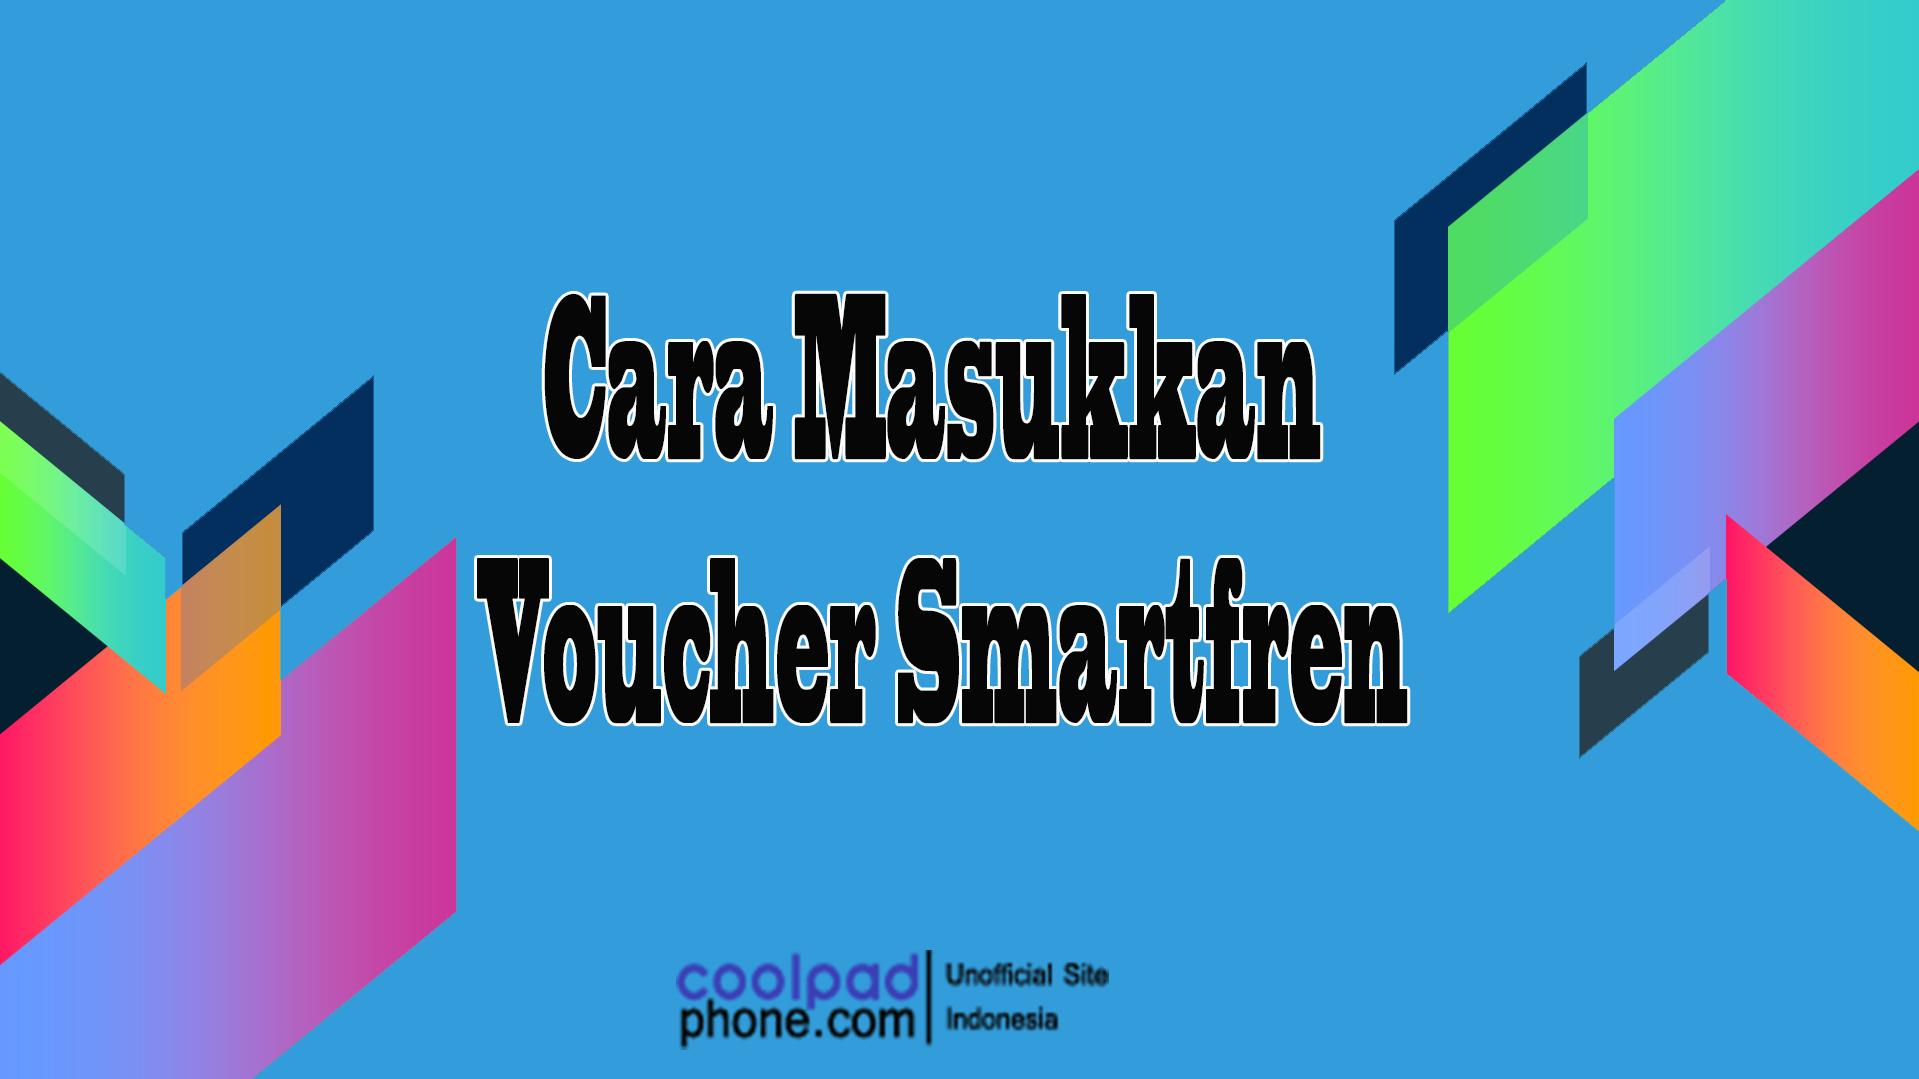 cara-masukkan-voucher-smartfren